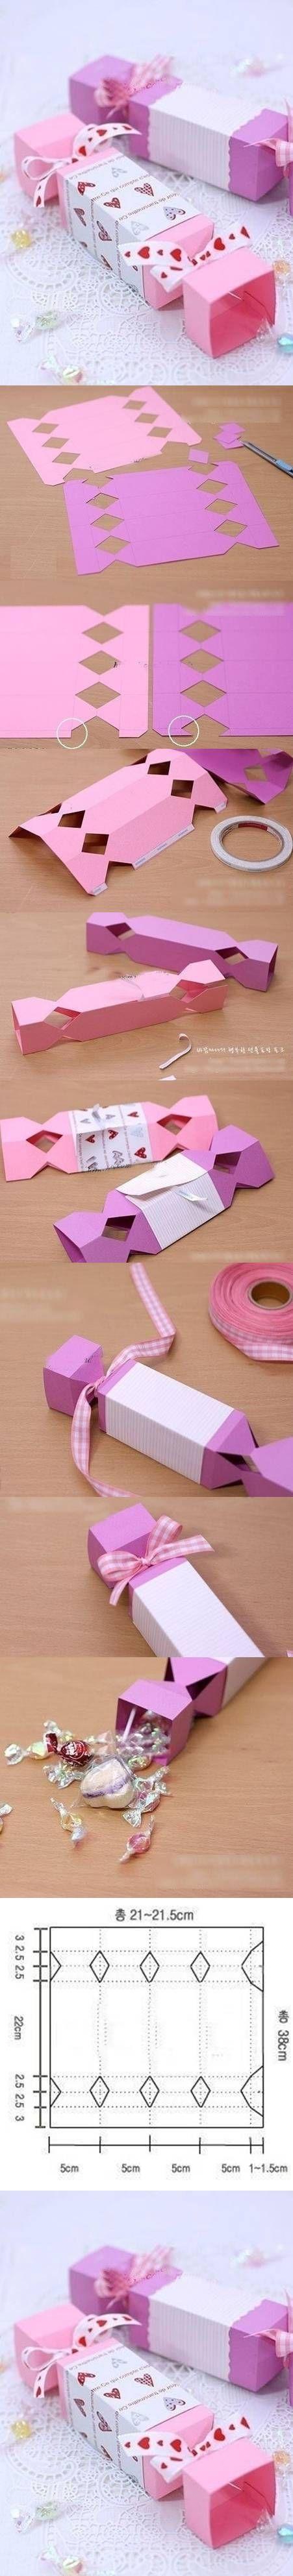 DIY Cute Candy Gift Box for Valentine's Day via usefuldiy.com